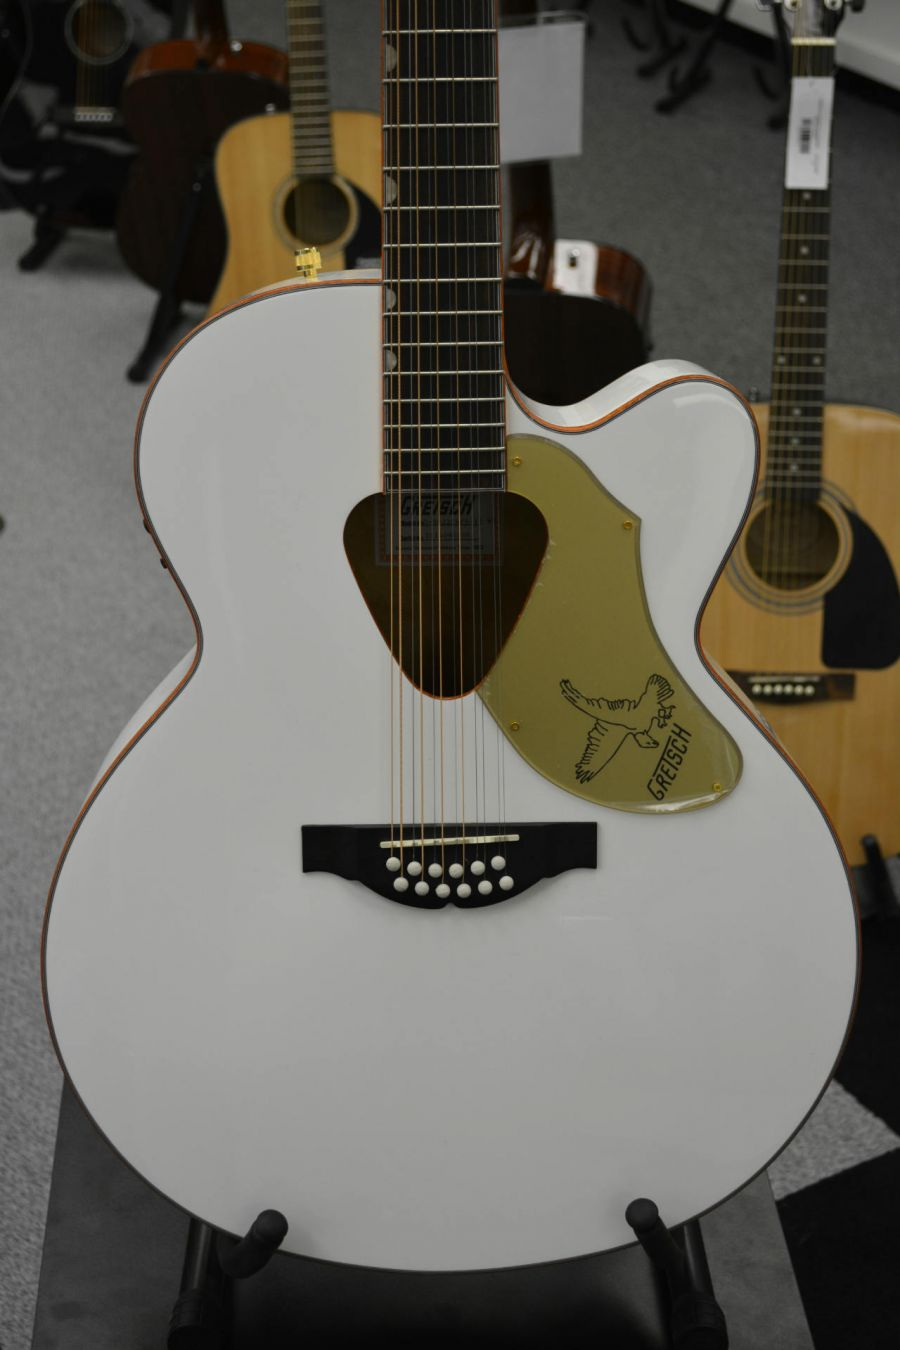 gretsch white falcon 12 string guitar g5022cwfe ebay. Black Bedroom Furniture Sets. Home Design Ideas